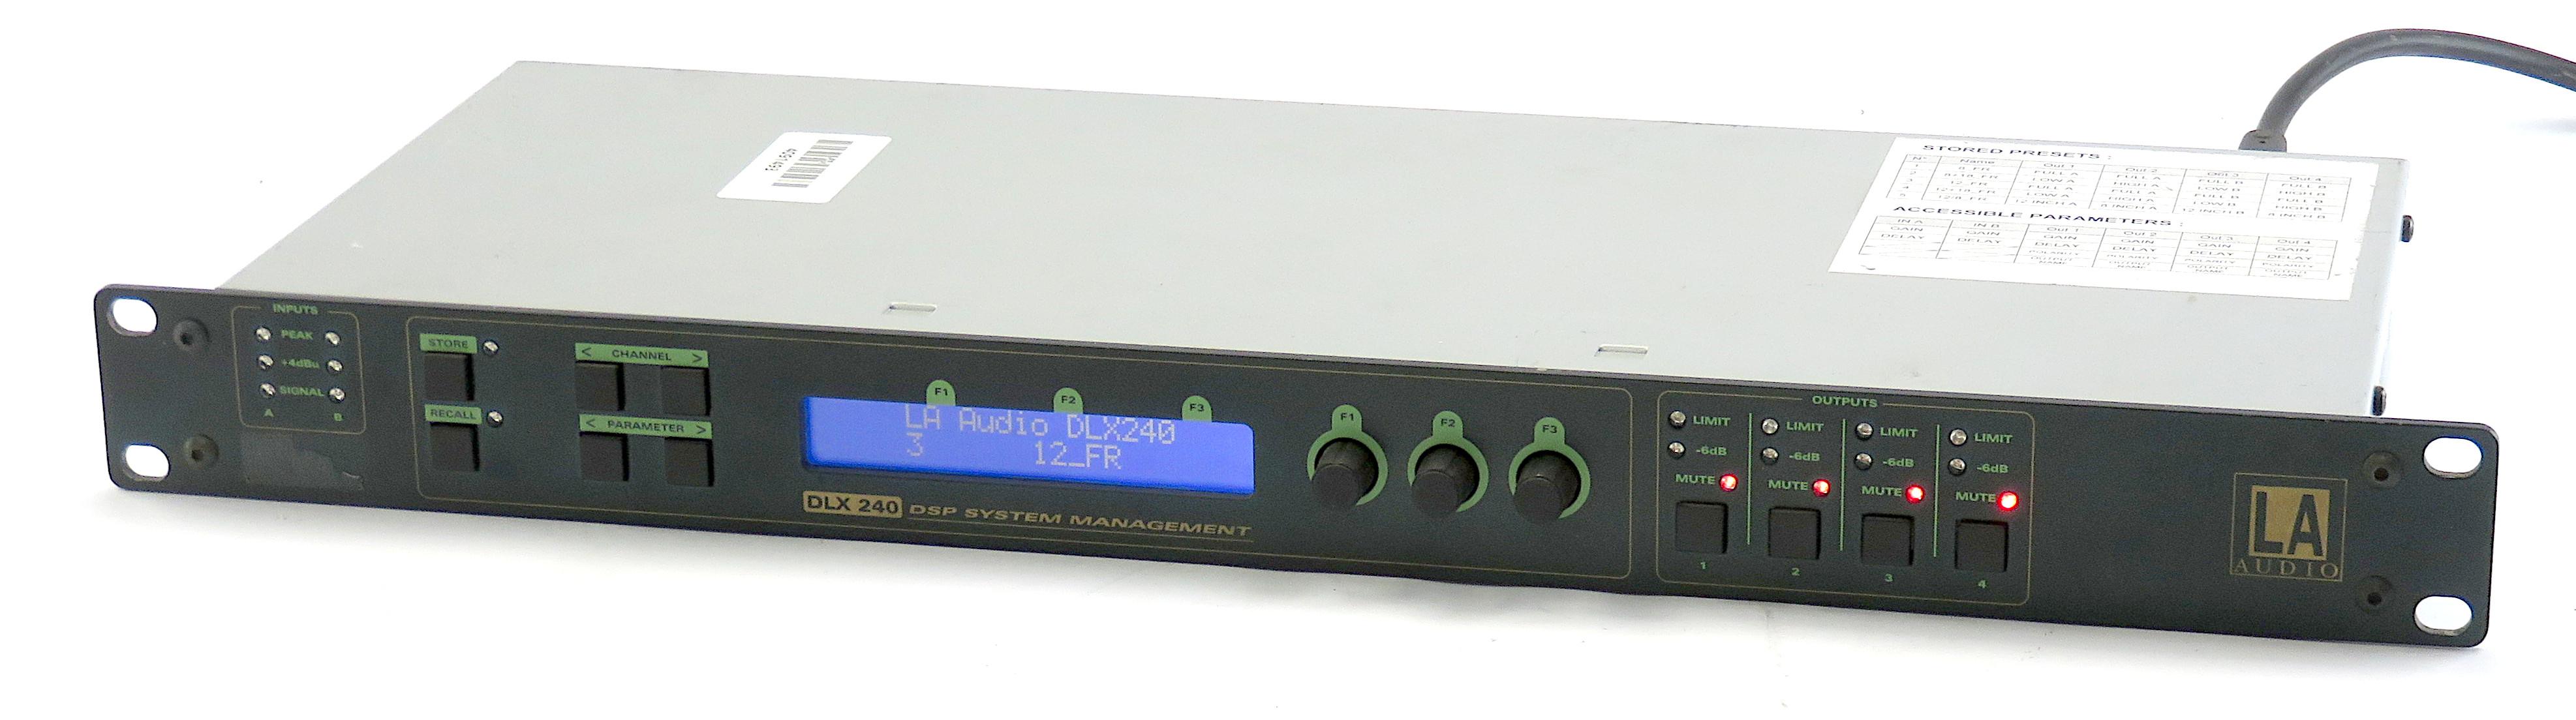 LA Audio DLX 240 Rackmount Digital Speaker Management Processor 2 Input+4 Output